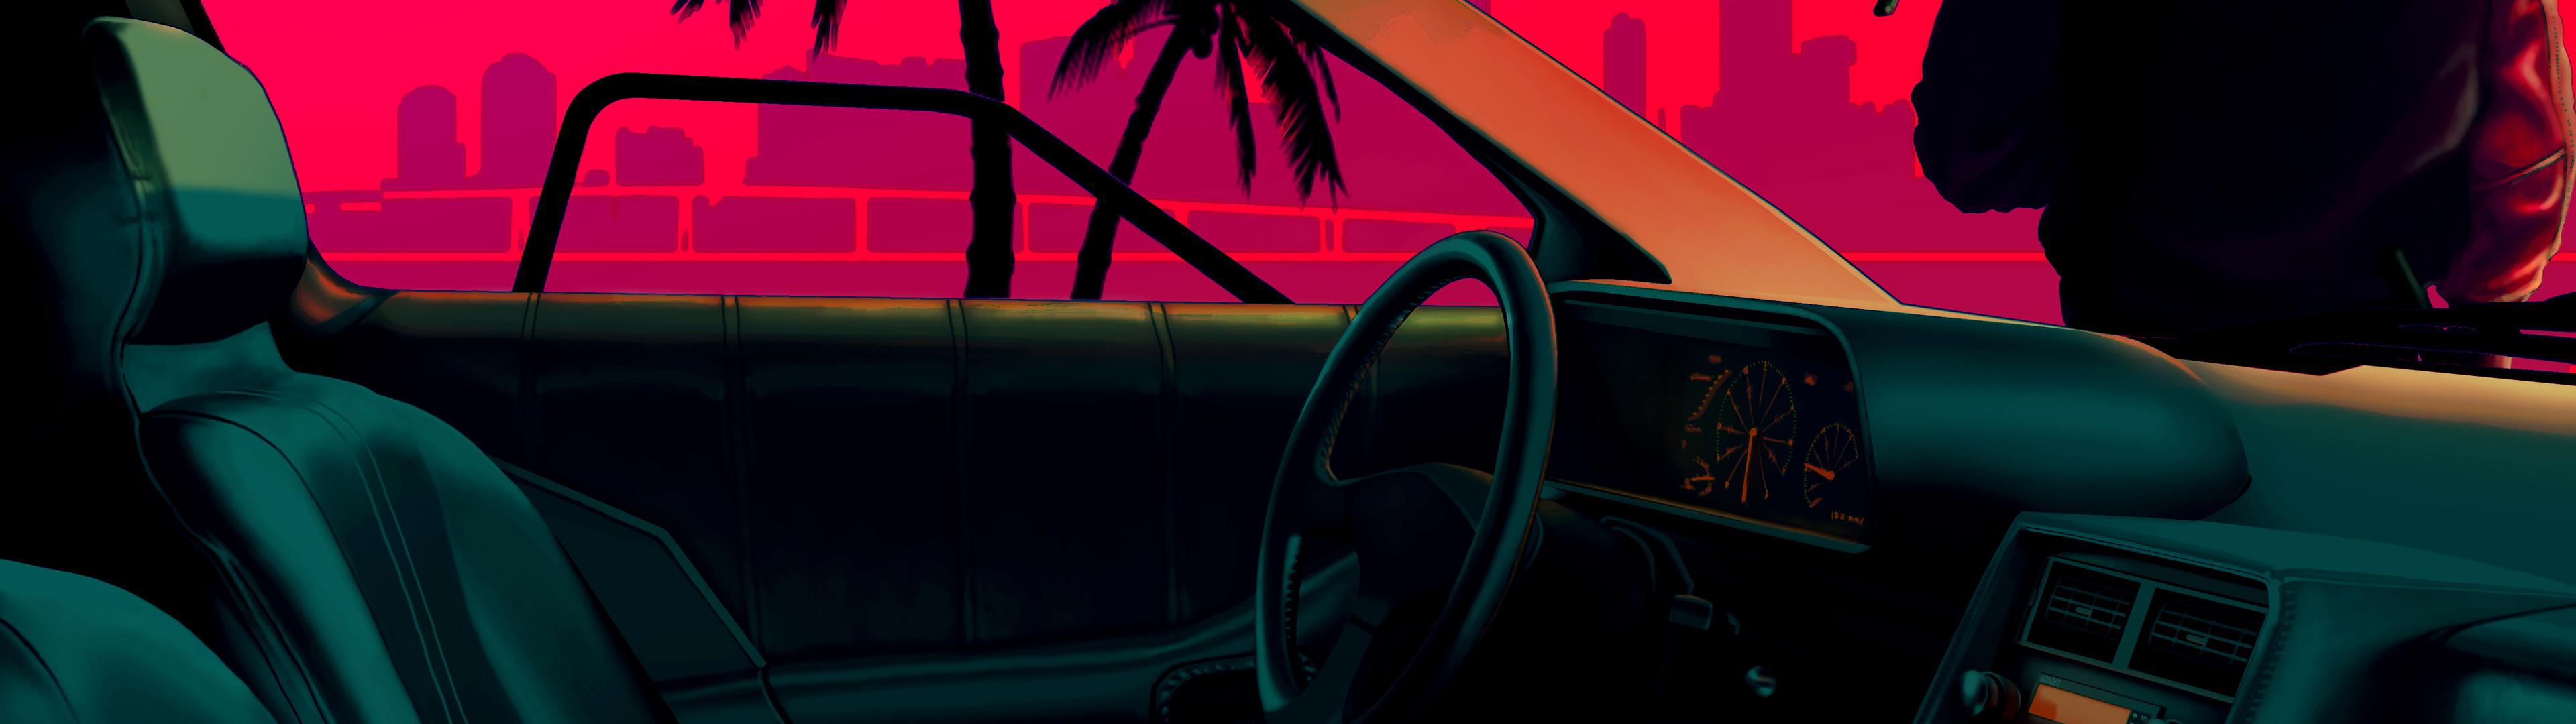 afbadcaacede-car-interiors-art-themes-wallpaper-wp3601595